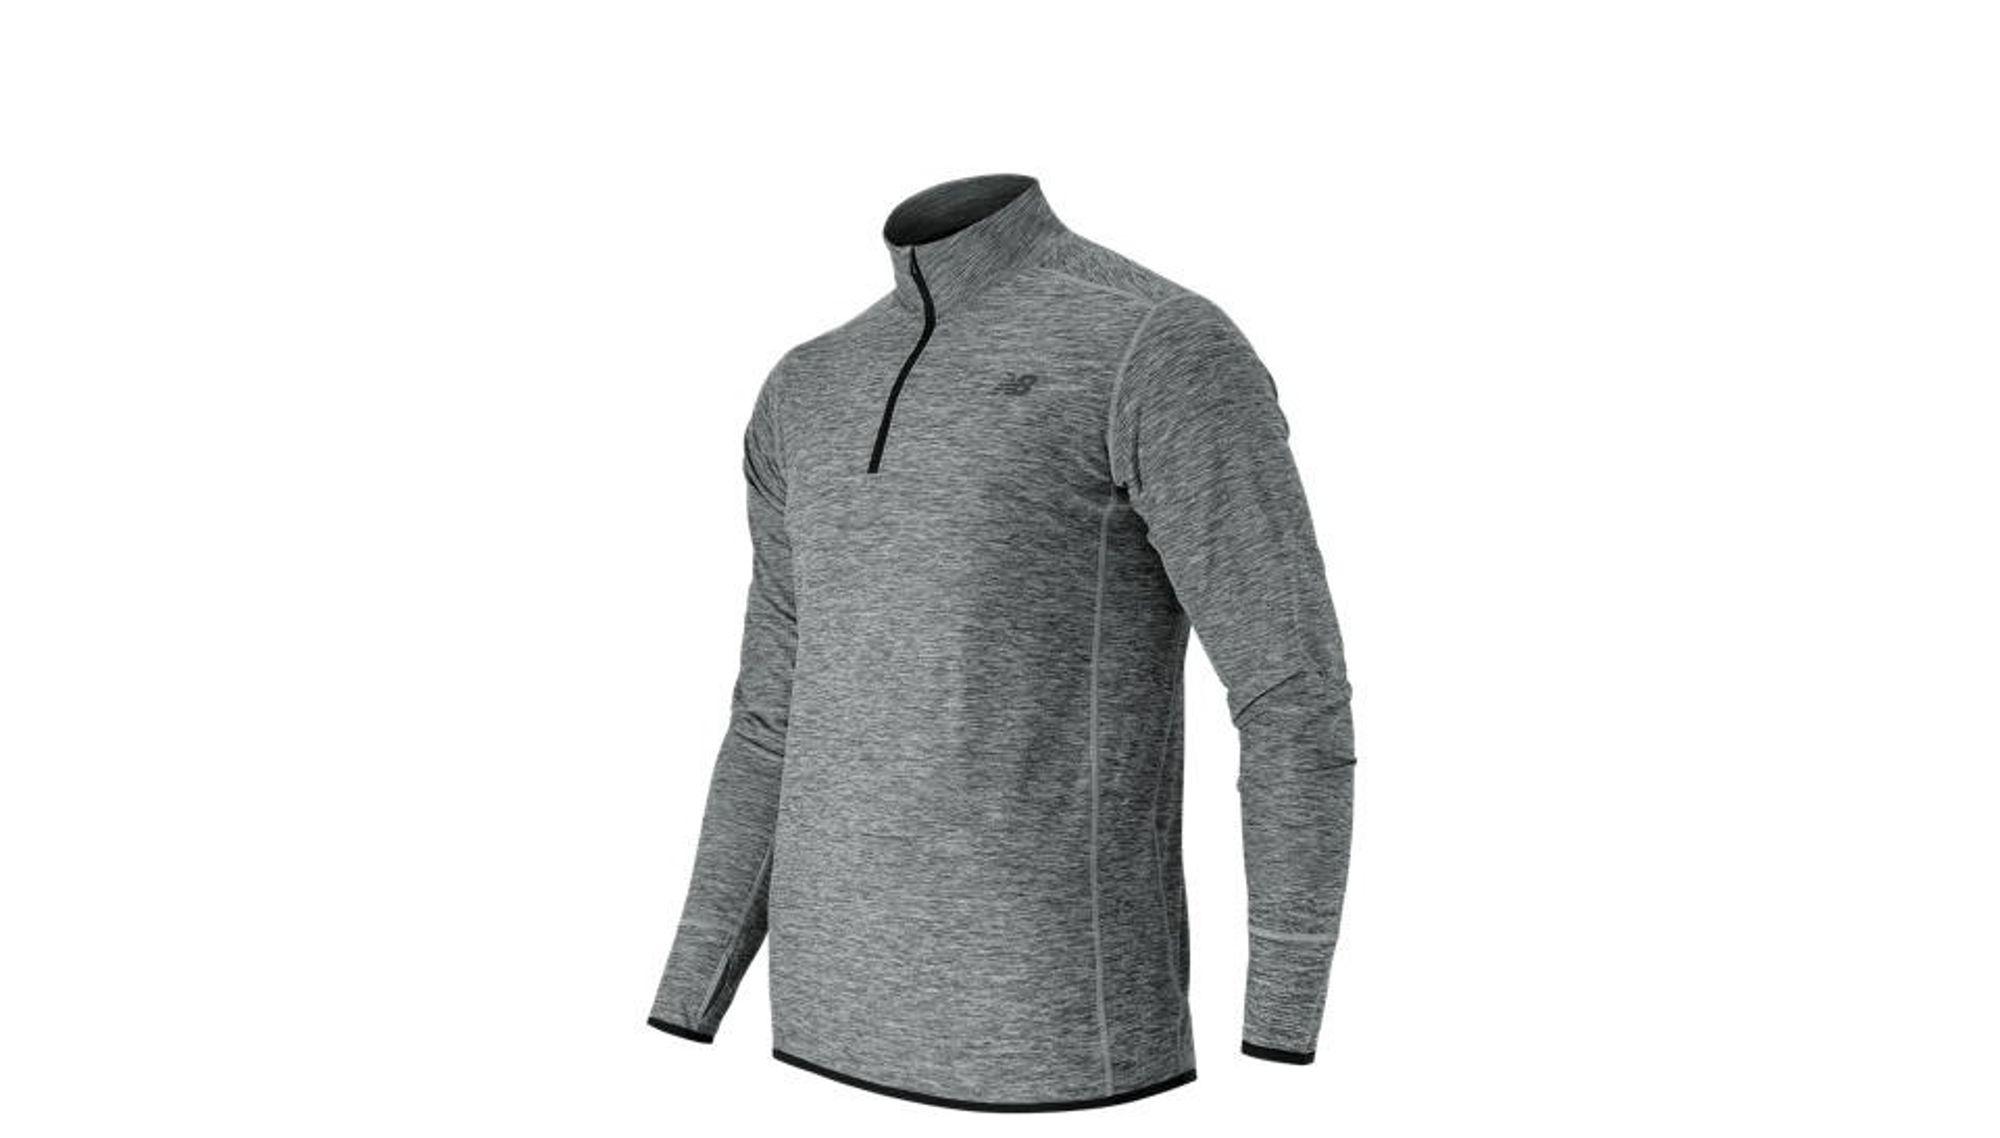 New Balance MT53030 Space Dye Quarter Zip - ag athletic grey